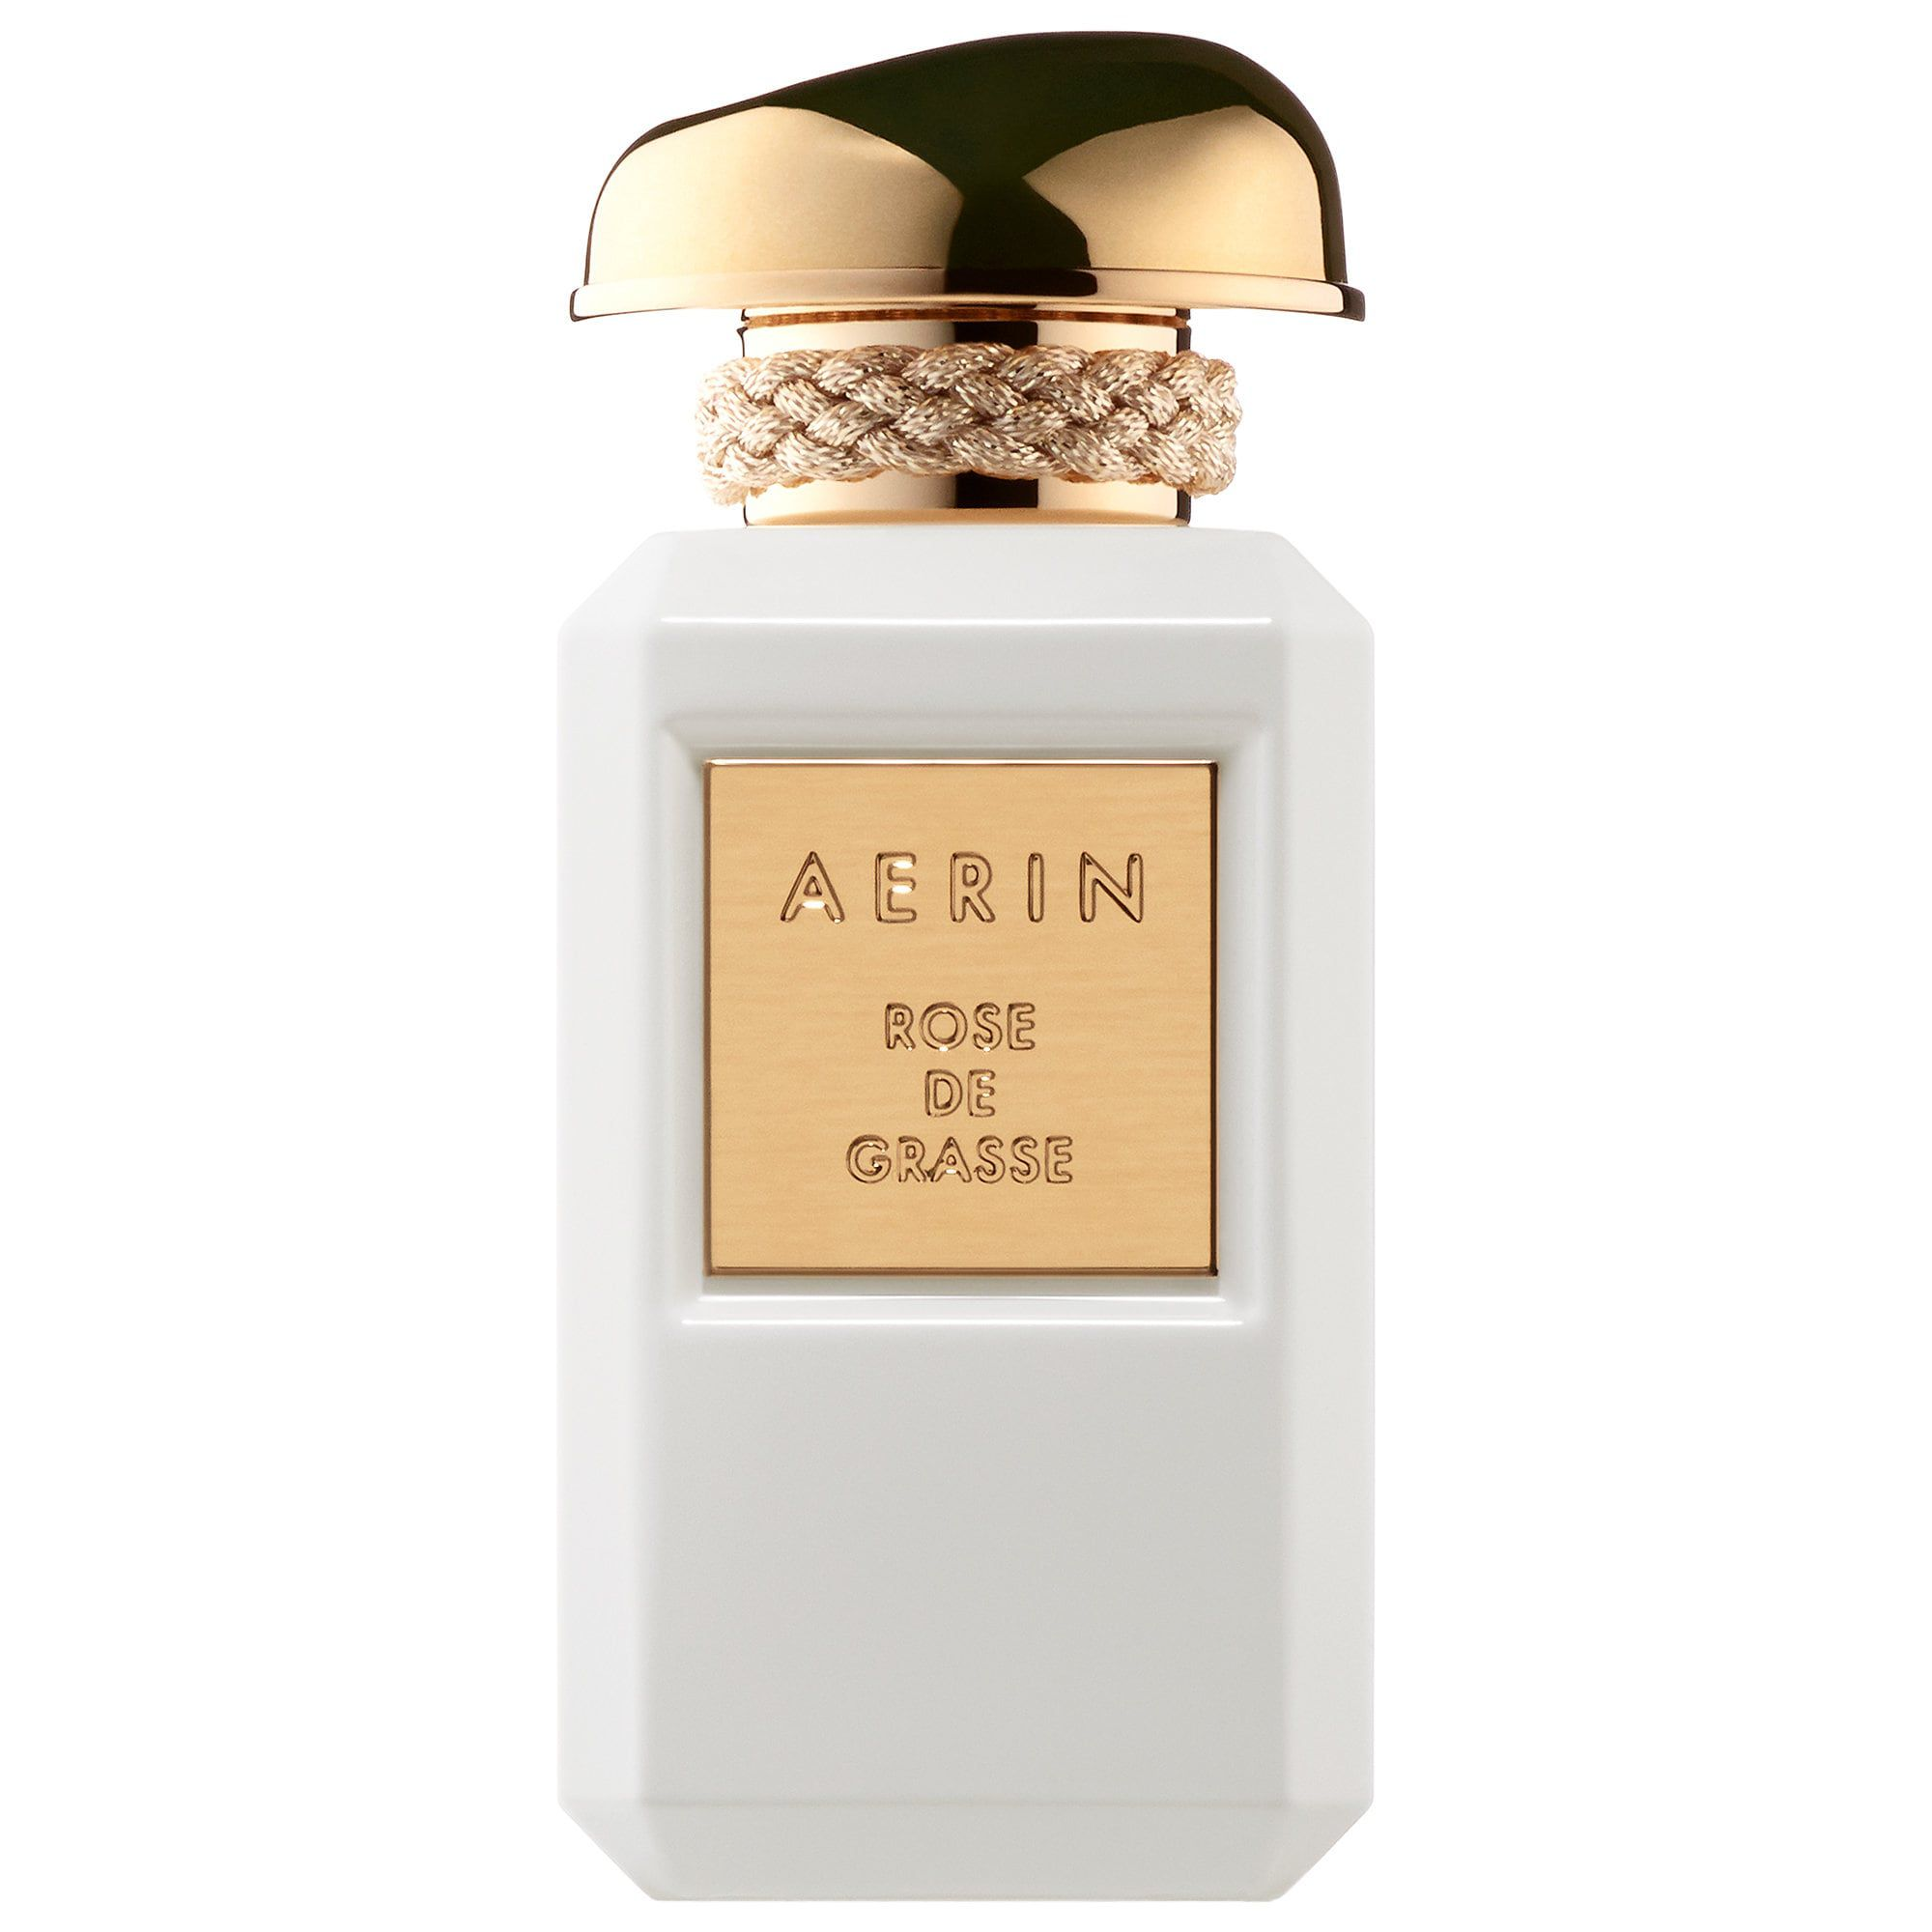 AERIN rose perfume